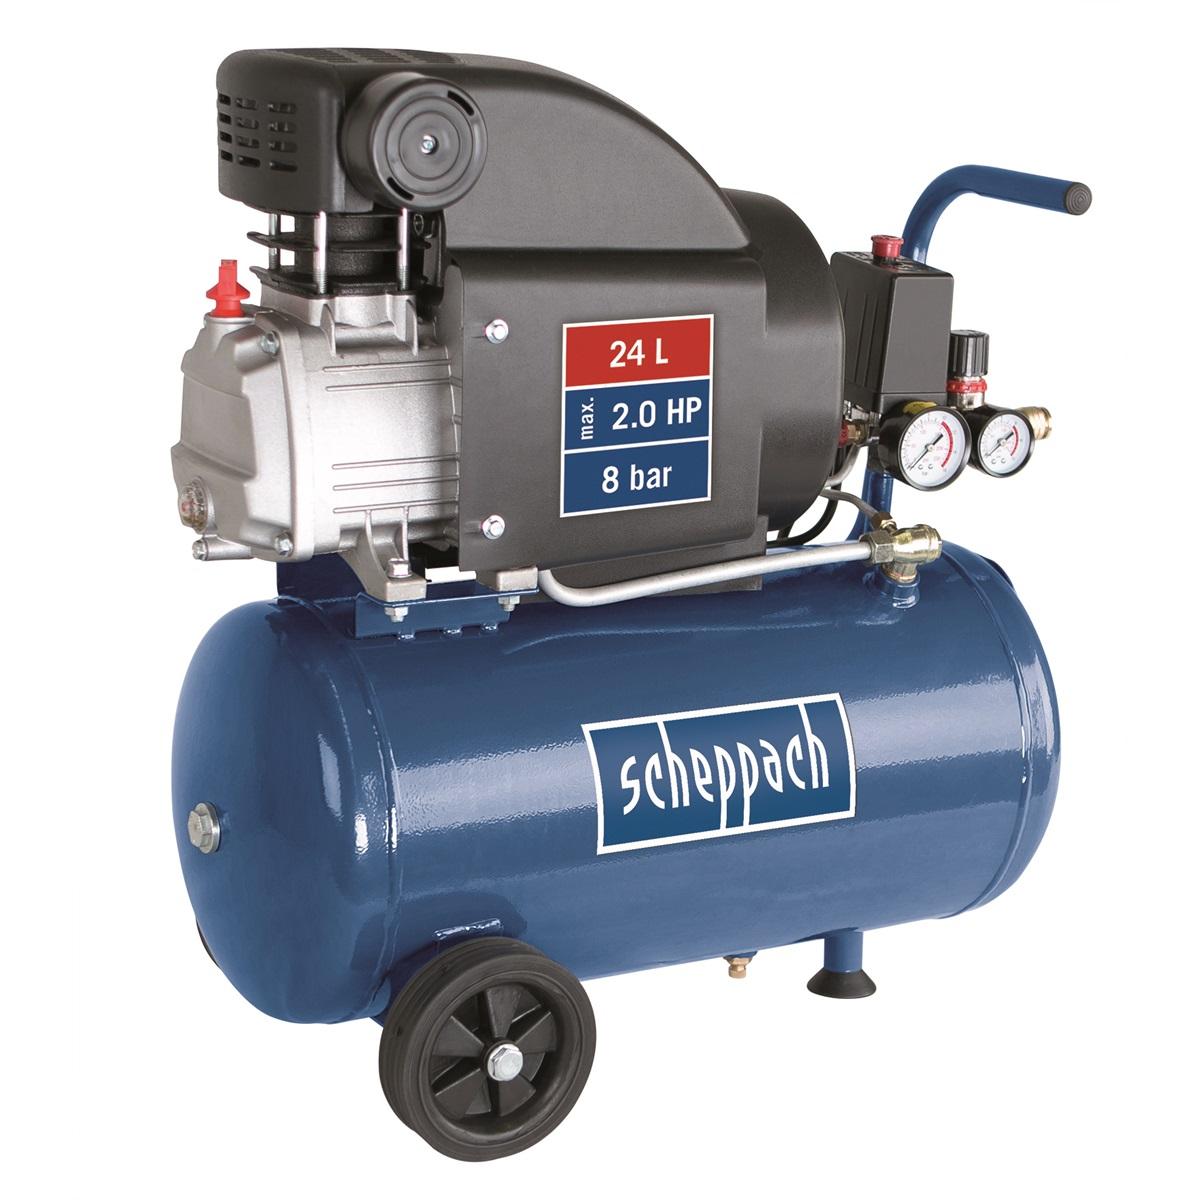 Scheppach HC 25, olejový kompresor 24 l